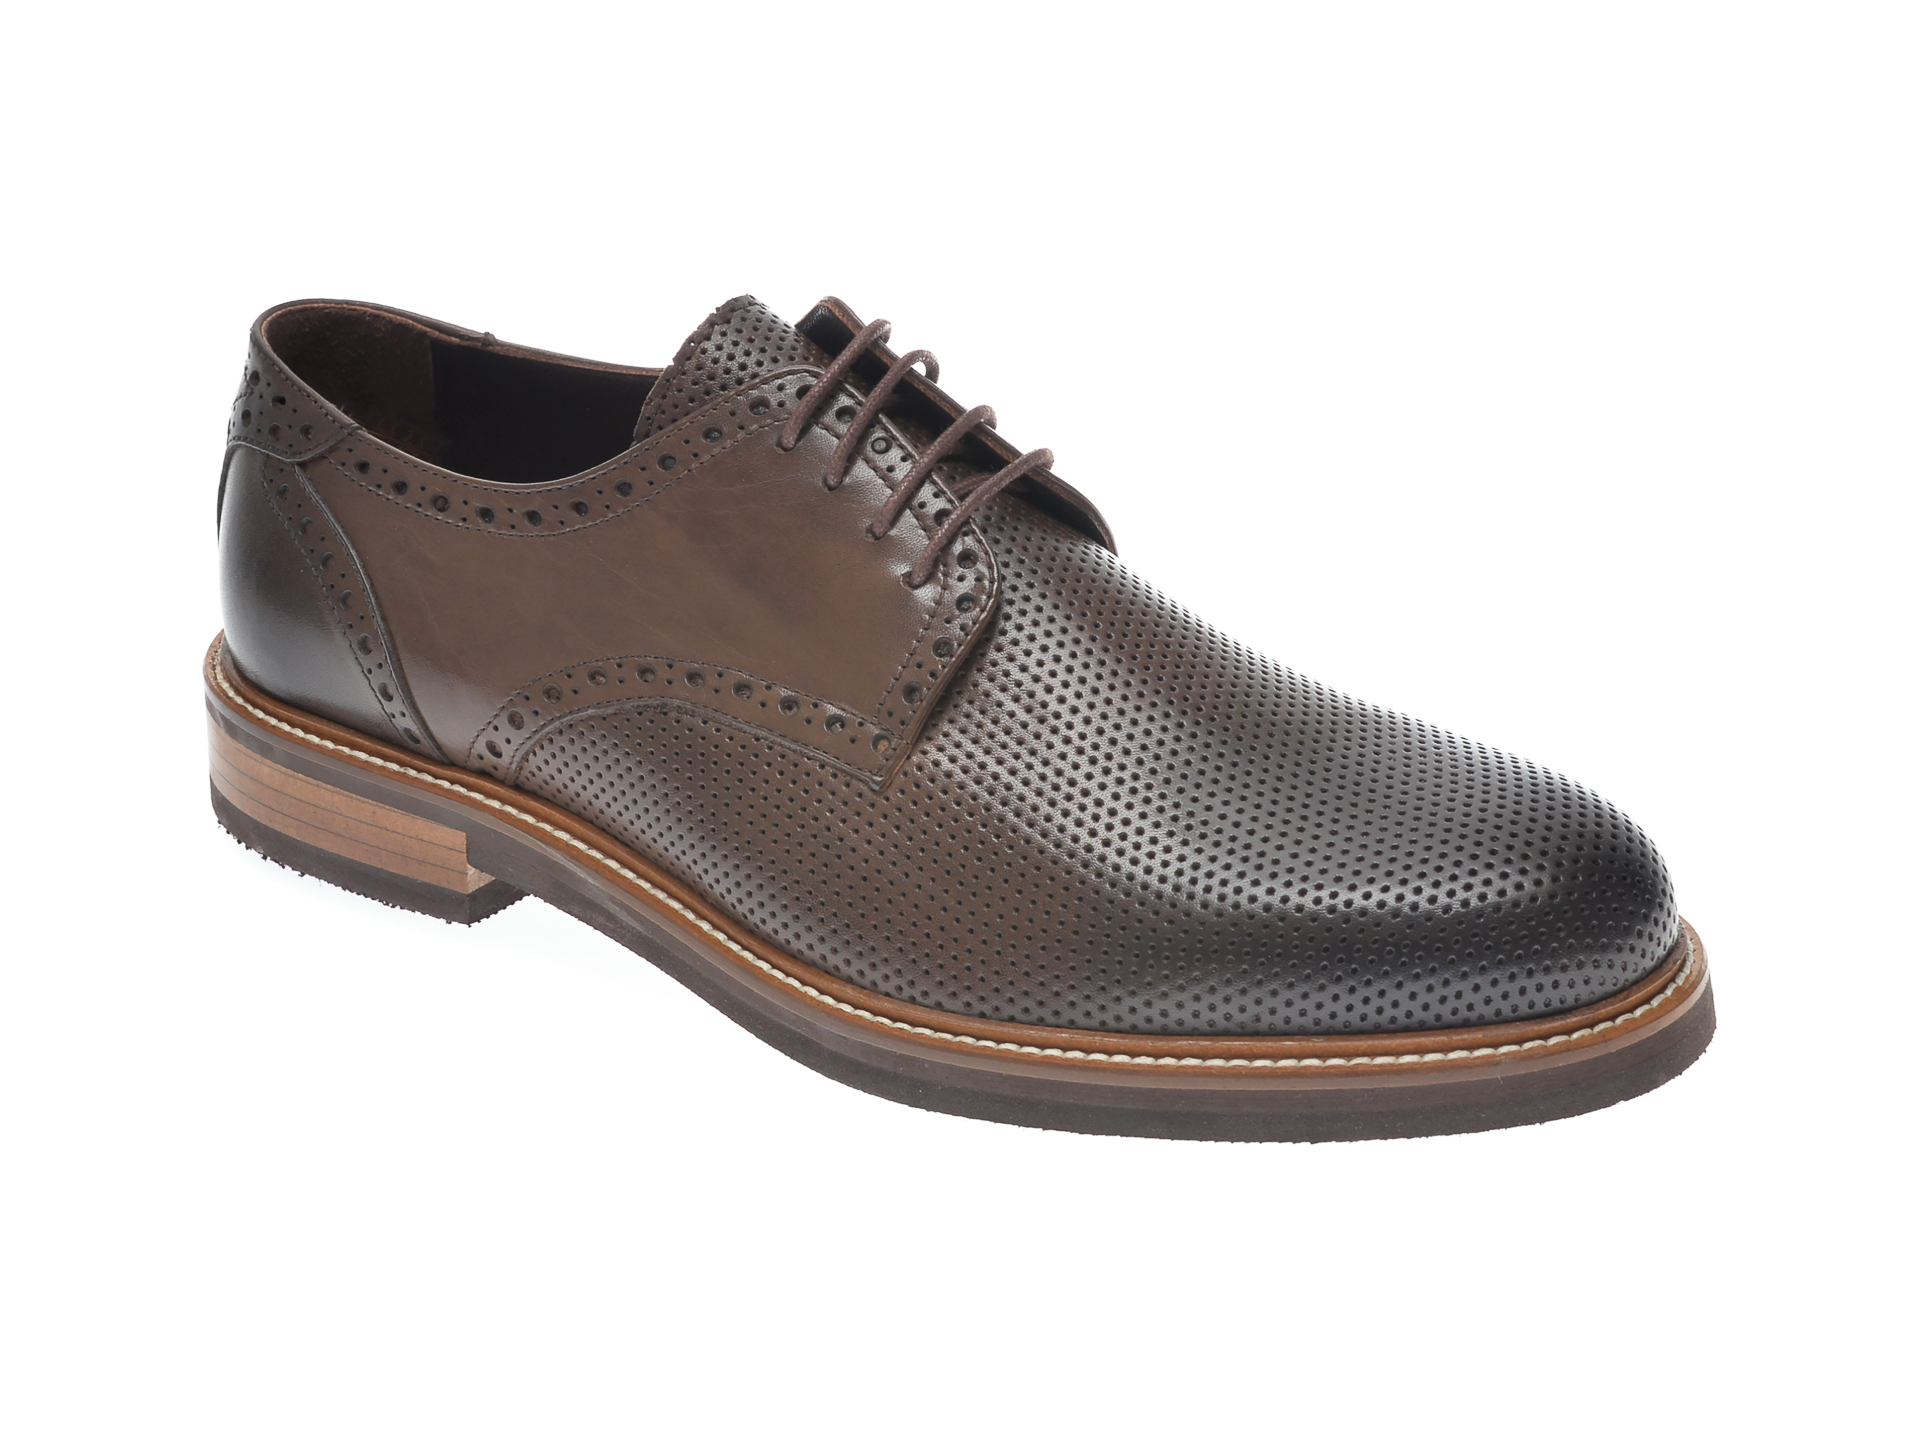 Pantofi OTTER maro, 7839, din piele naturala imagine